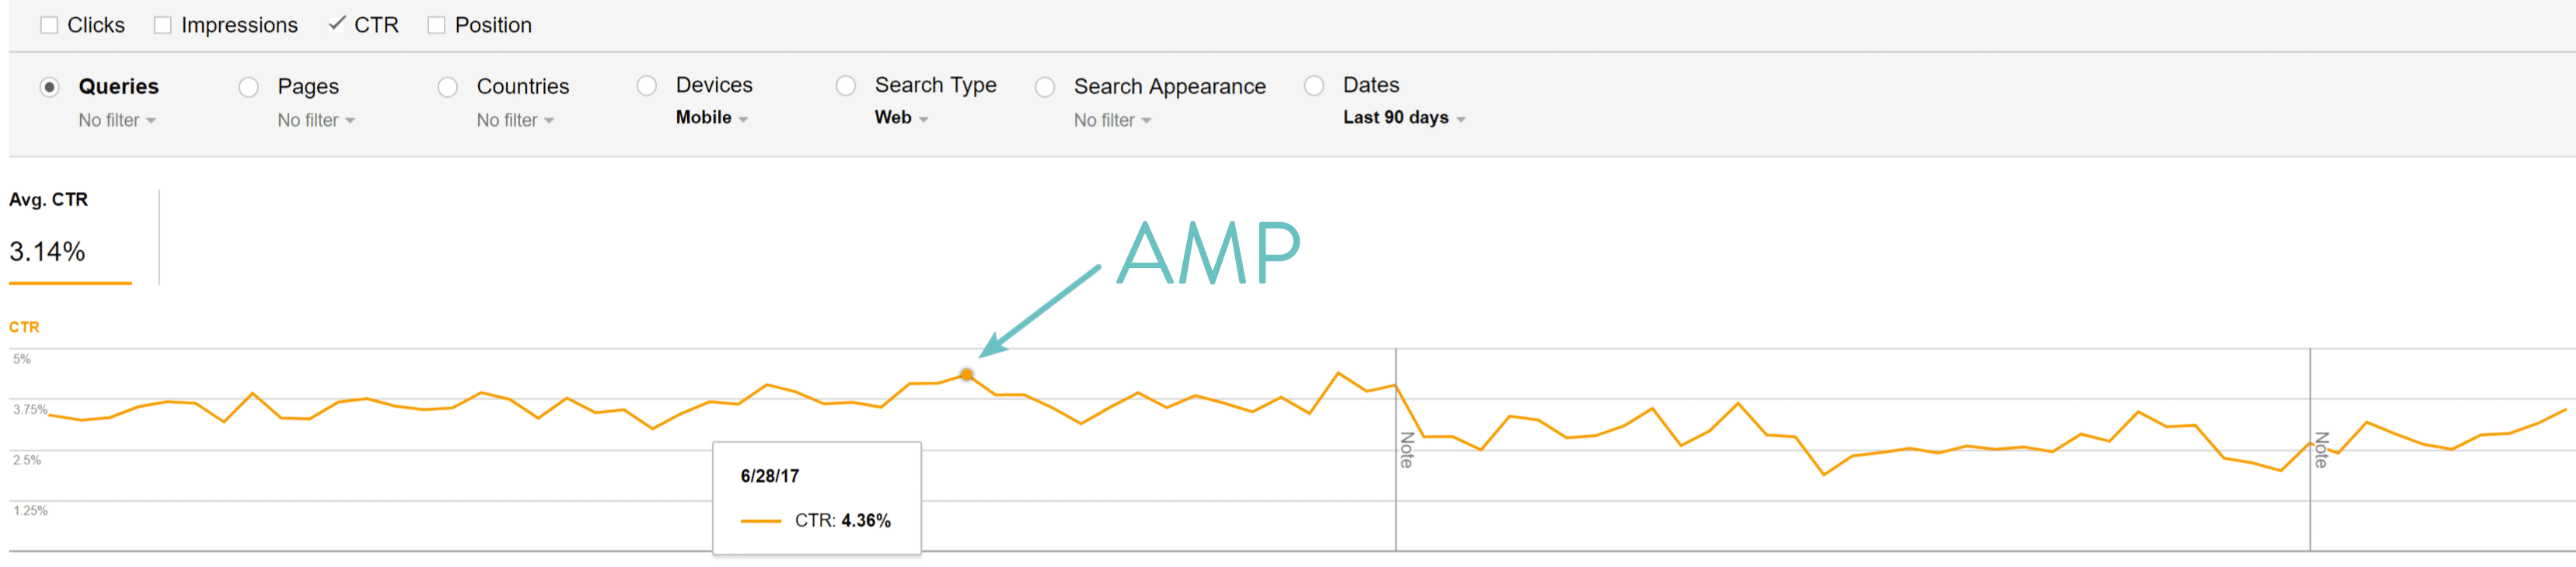 Google AMP CTR